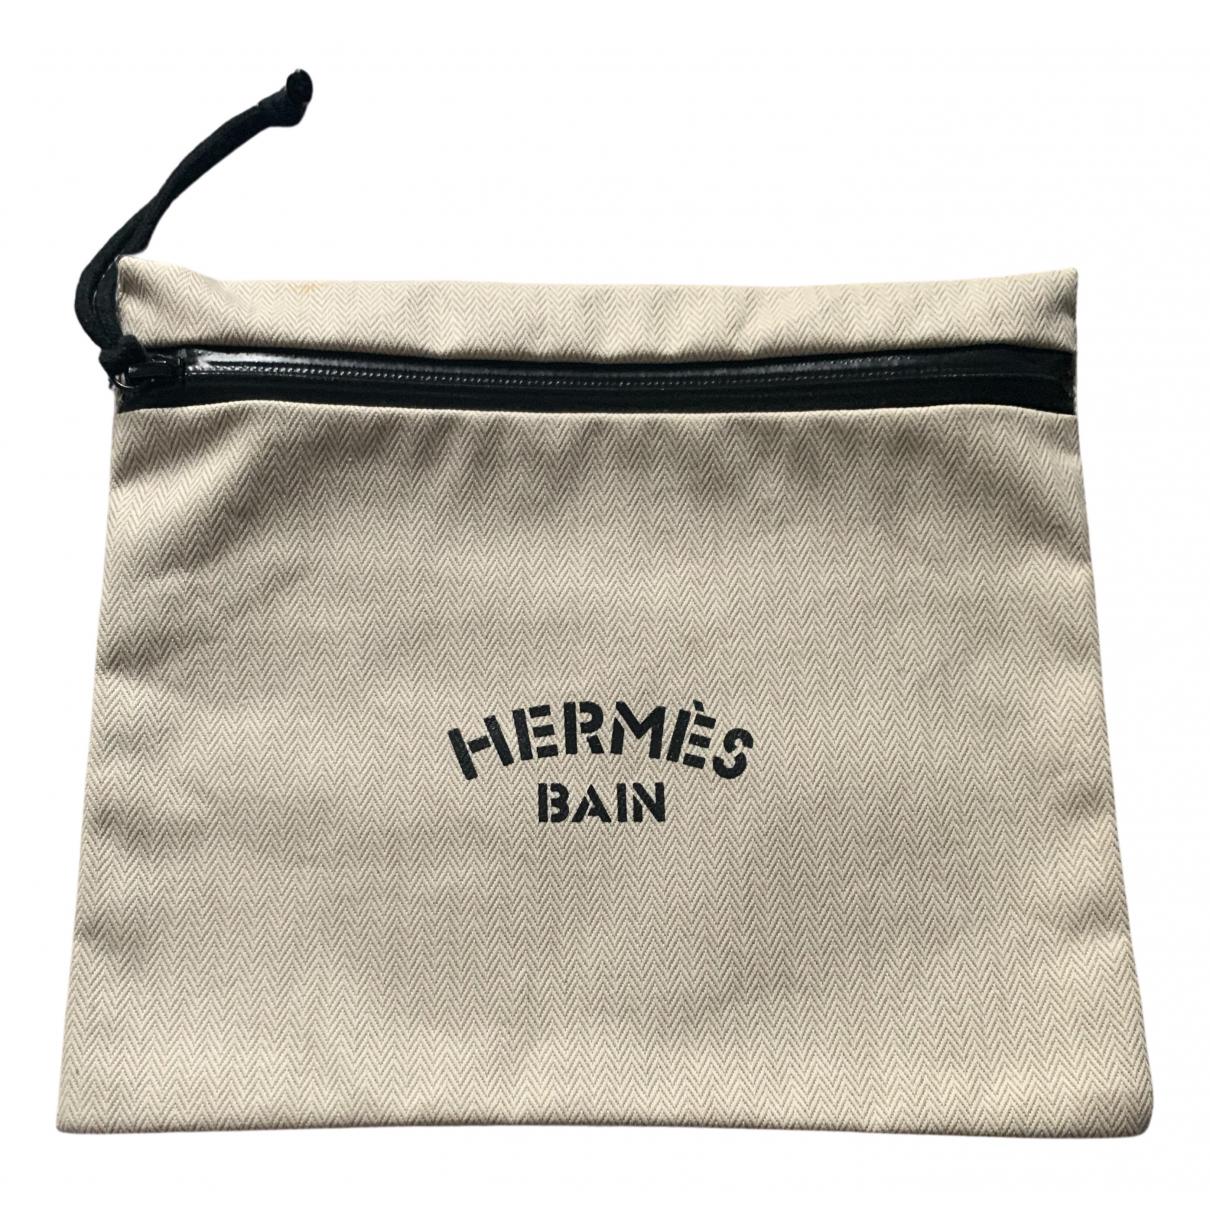 Hermes - Pochette   pour femme en toile - beige